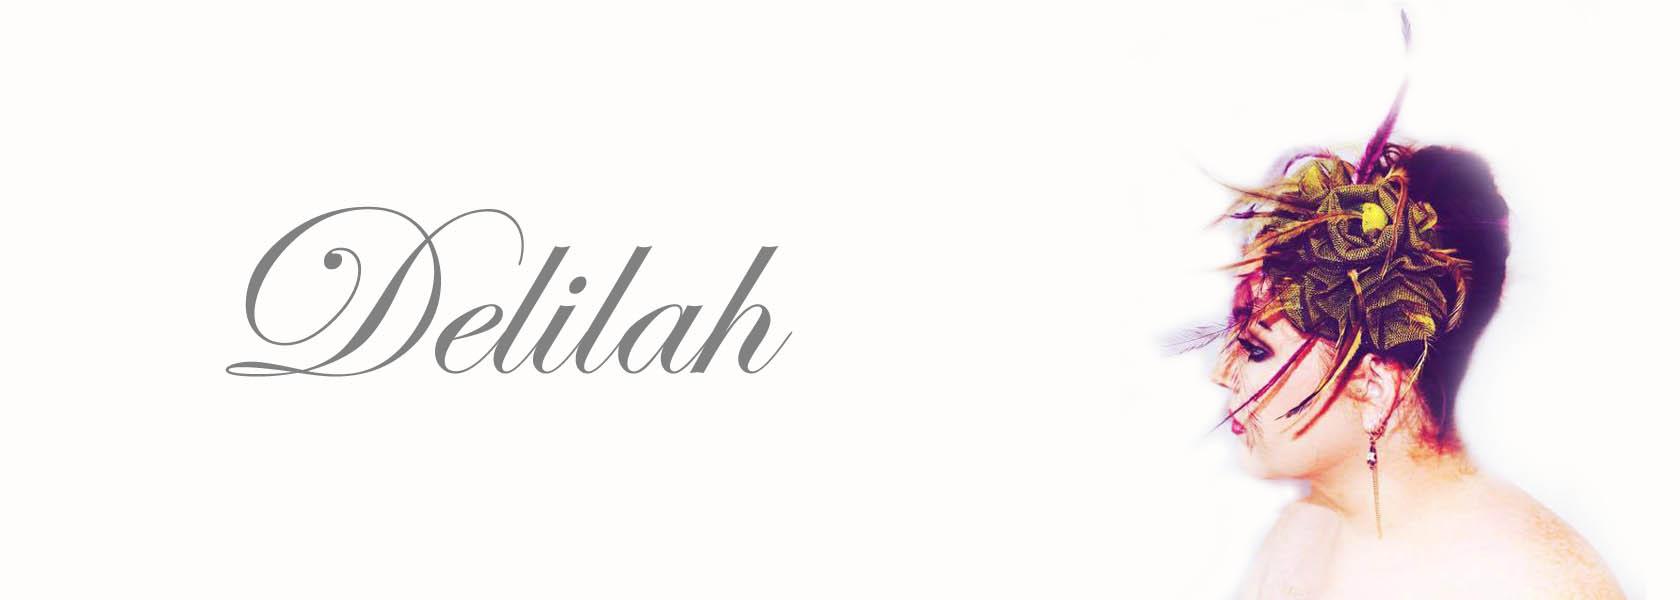 Delilah - Saraden Designs